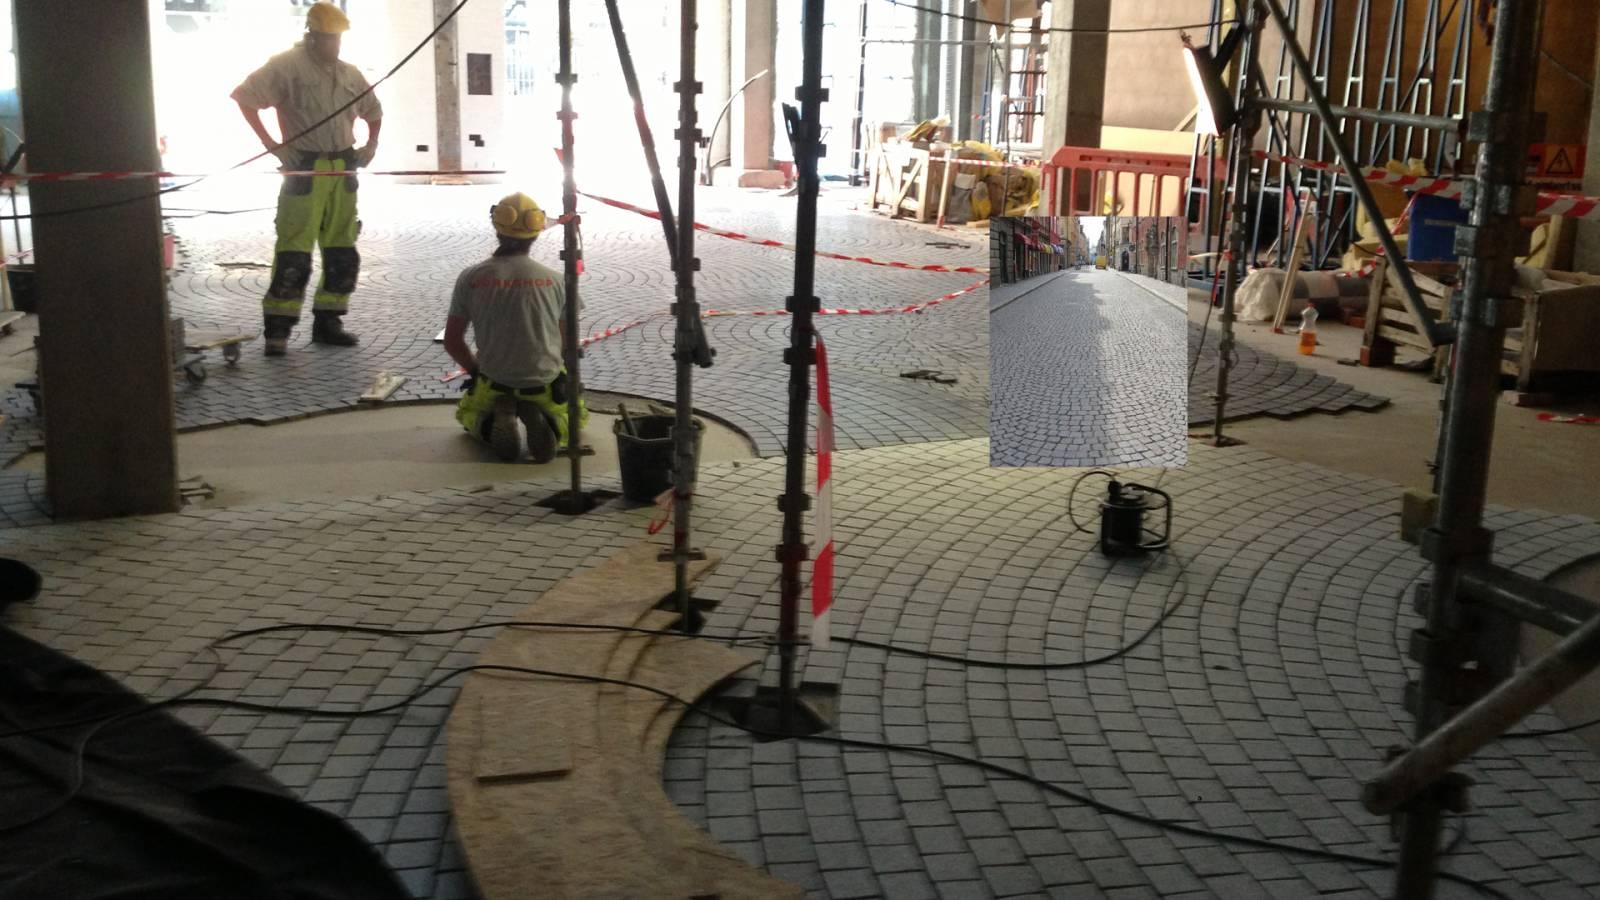 CLEAN CUT PAVING - Akers Mek Verksted - SPOL Architects